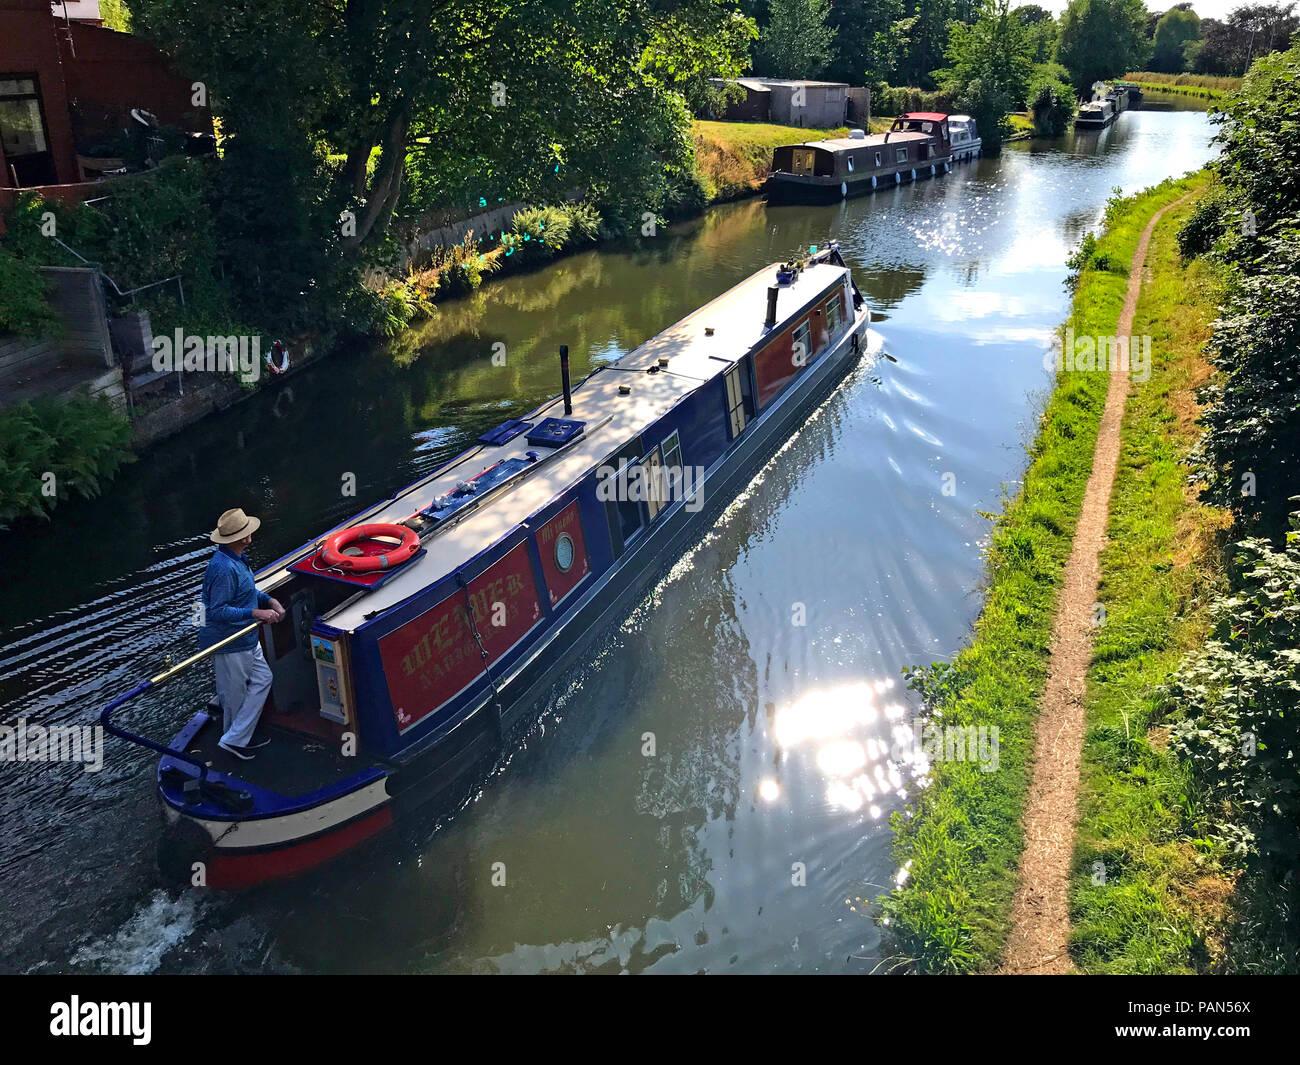 @HotpixUK,GoTonySmith,barge,longboat,Canal boat,at,Cheshire,North West England,UK,WA4,water,navigation,summer,time,summertime,boat,boating,barging,hire,sail,sailing,reflections,towpath